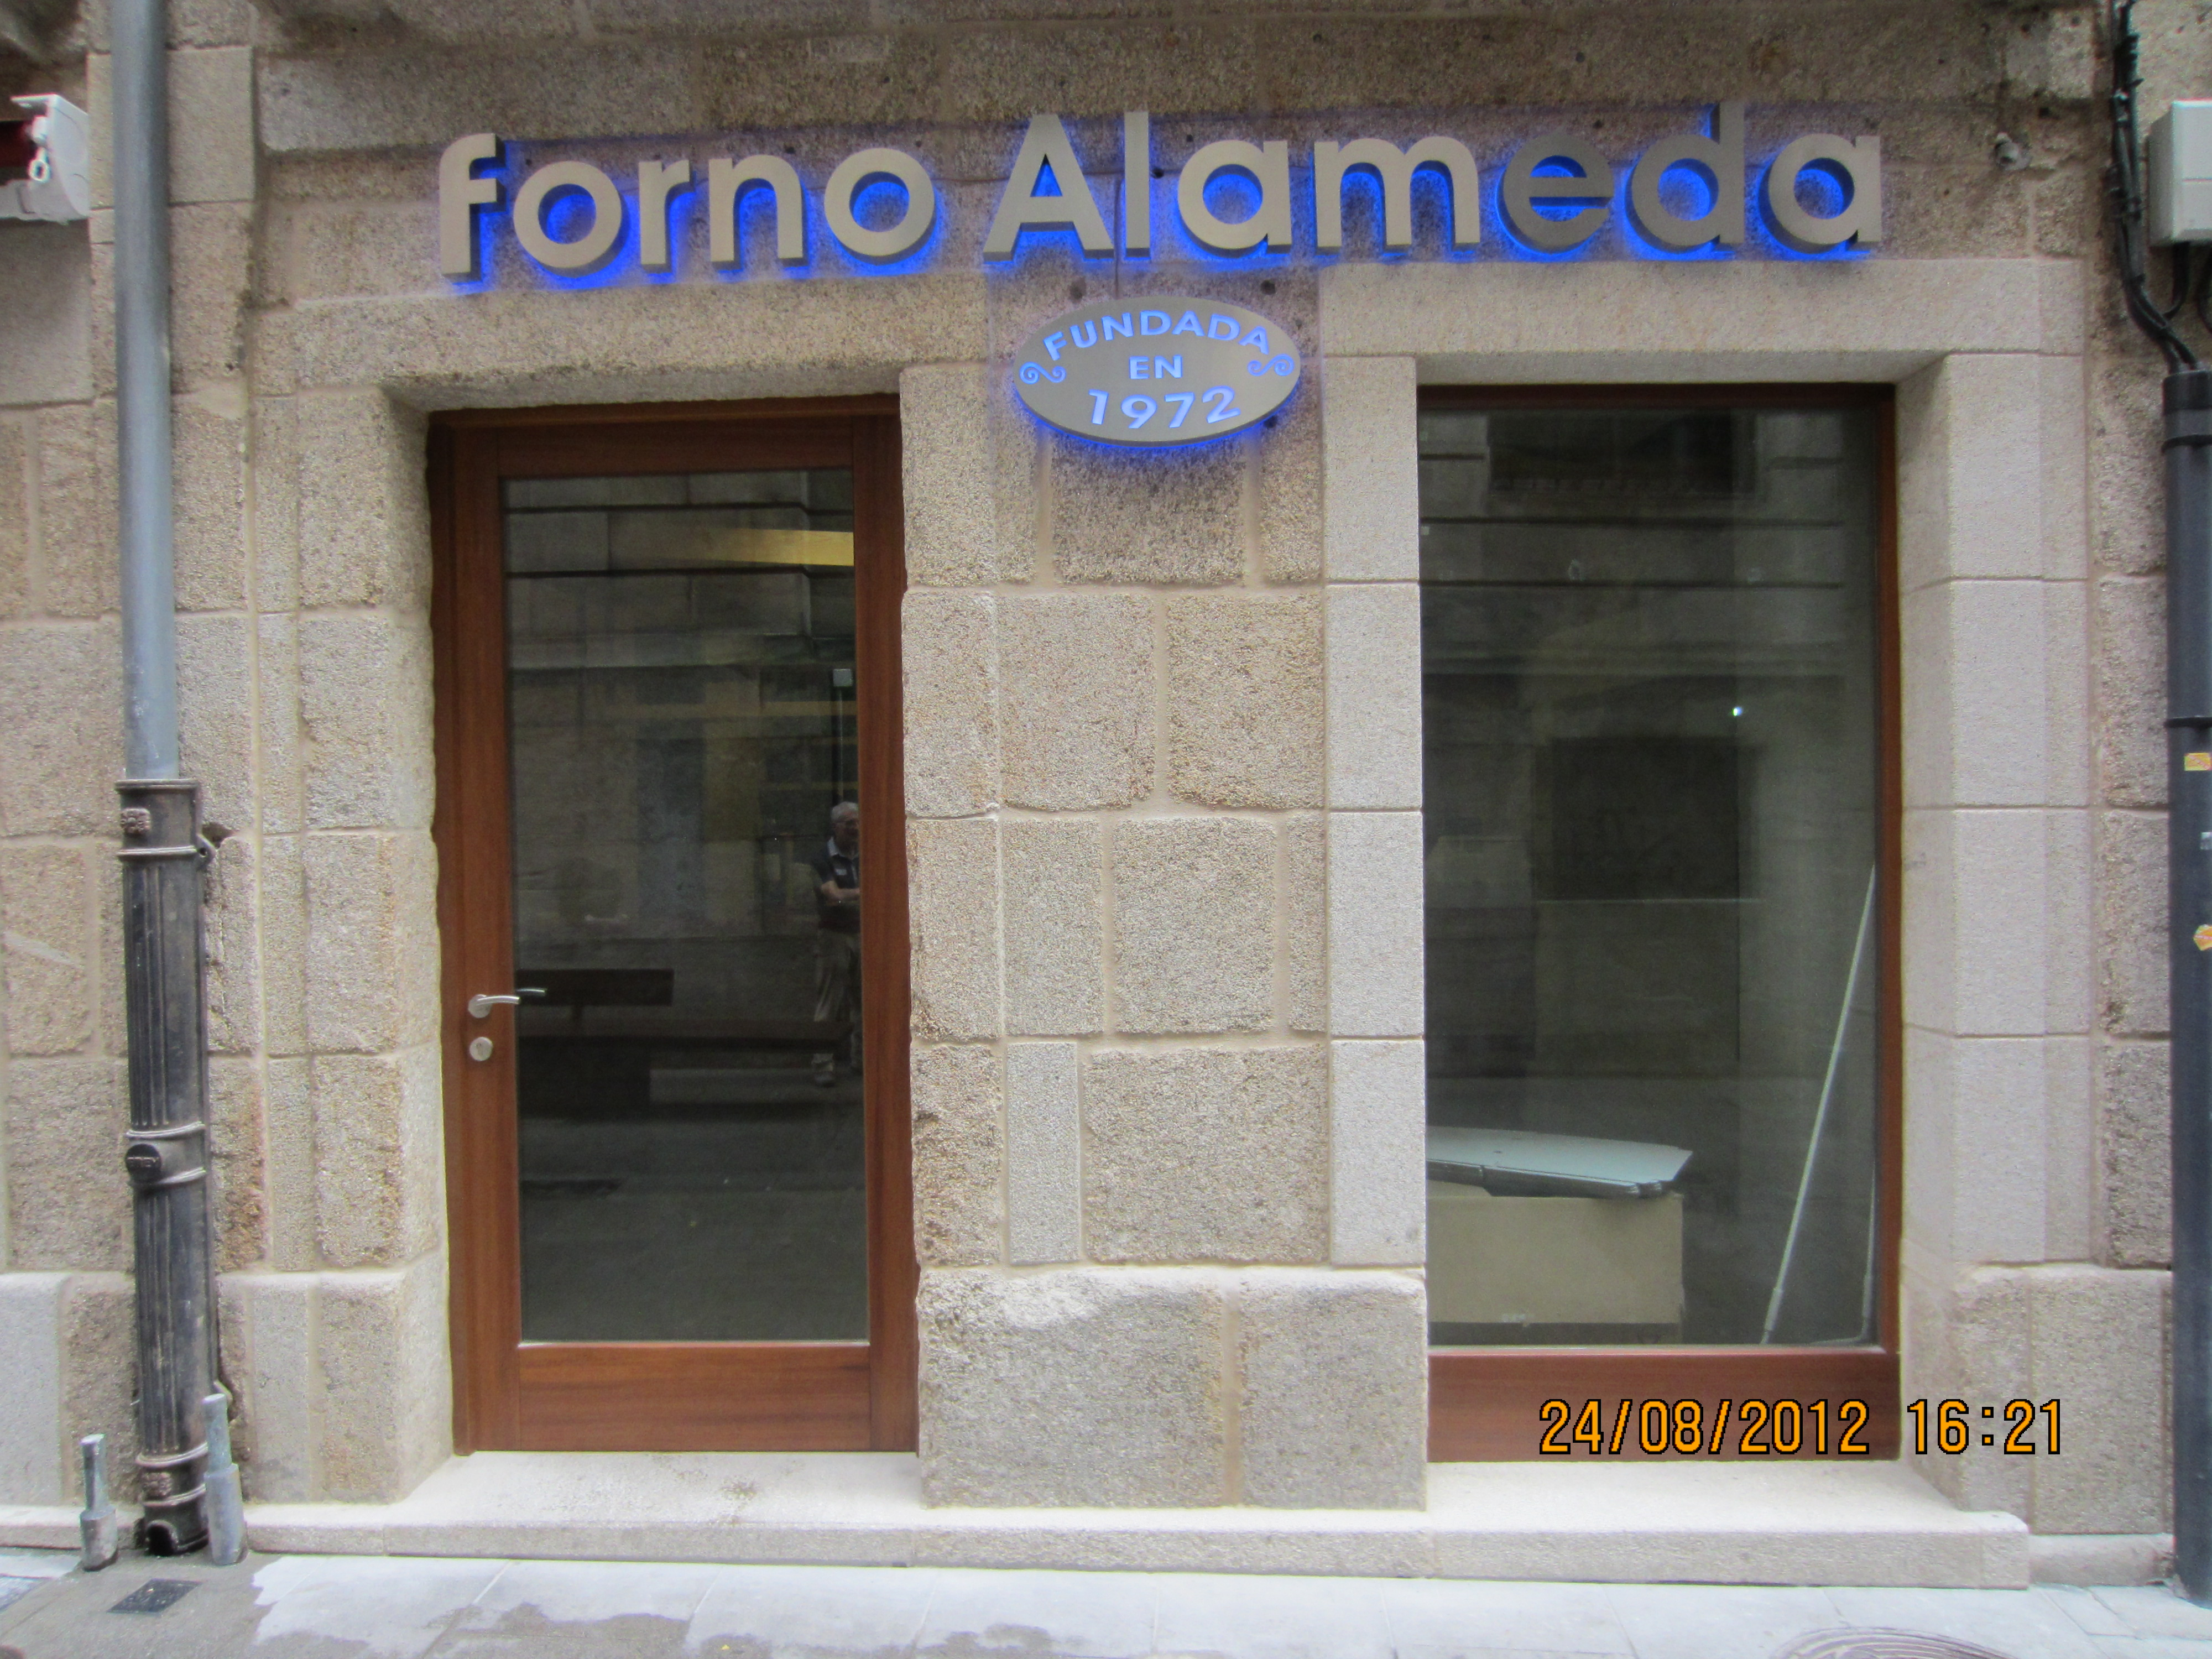 http://luzcoruna.es/wp-content/uploads/2020/03/forno-alameda-001.jpg